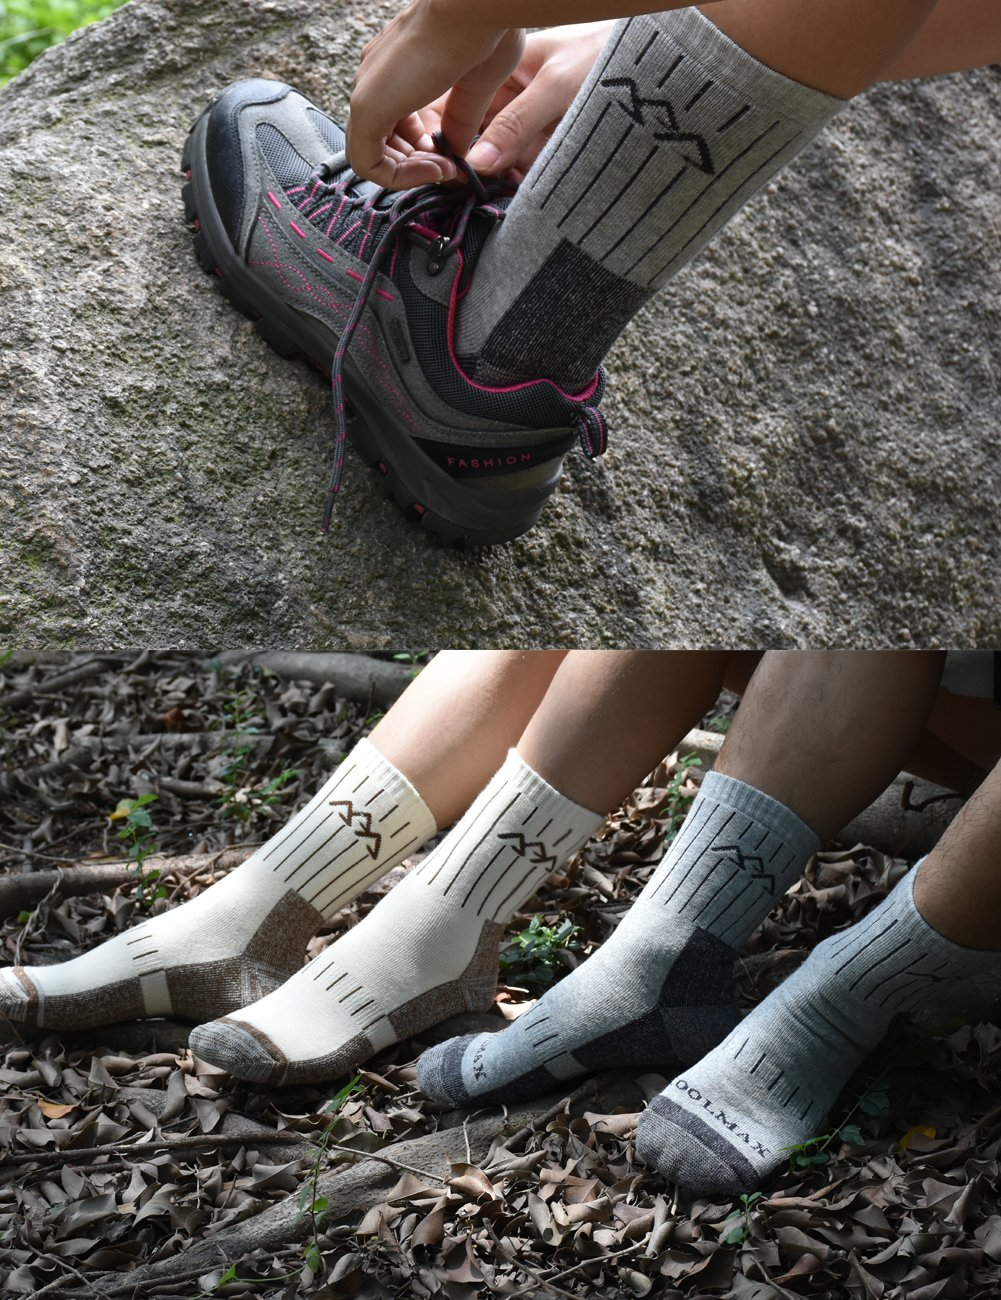 SUDILO Crew Cushion Hiking Trekking Socks,Coolmax Multi Performance Antiskid Wicking Outdoor Athletic Socks by SUDILO (Image #6)